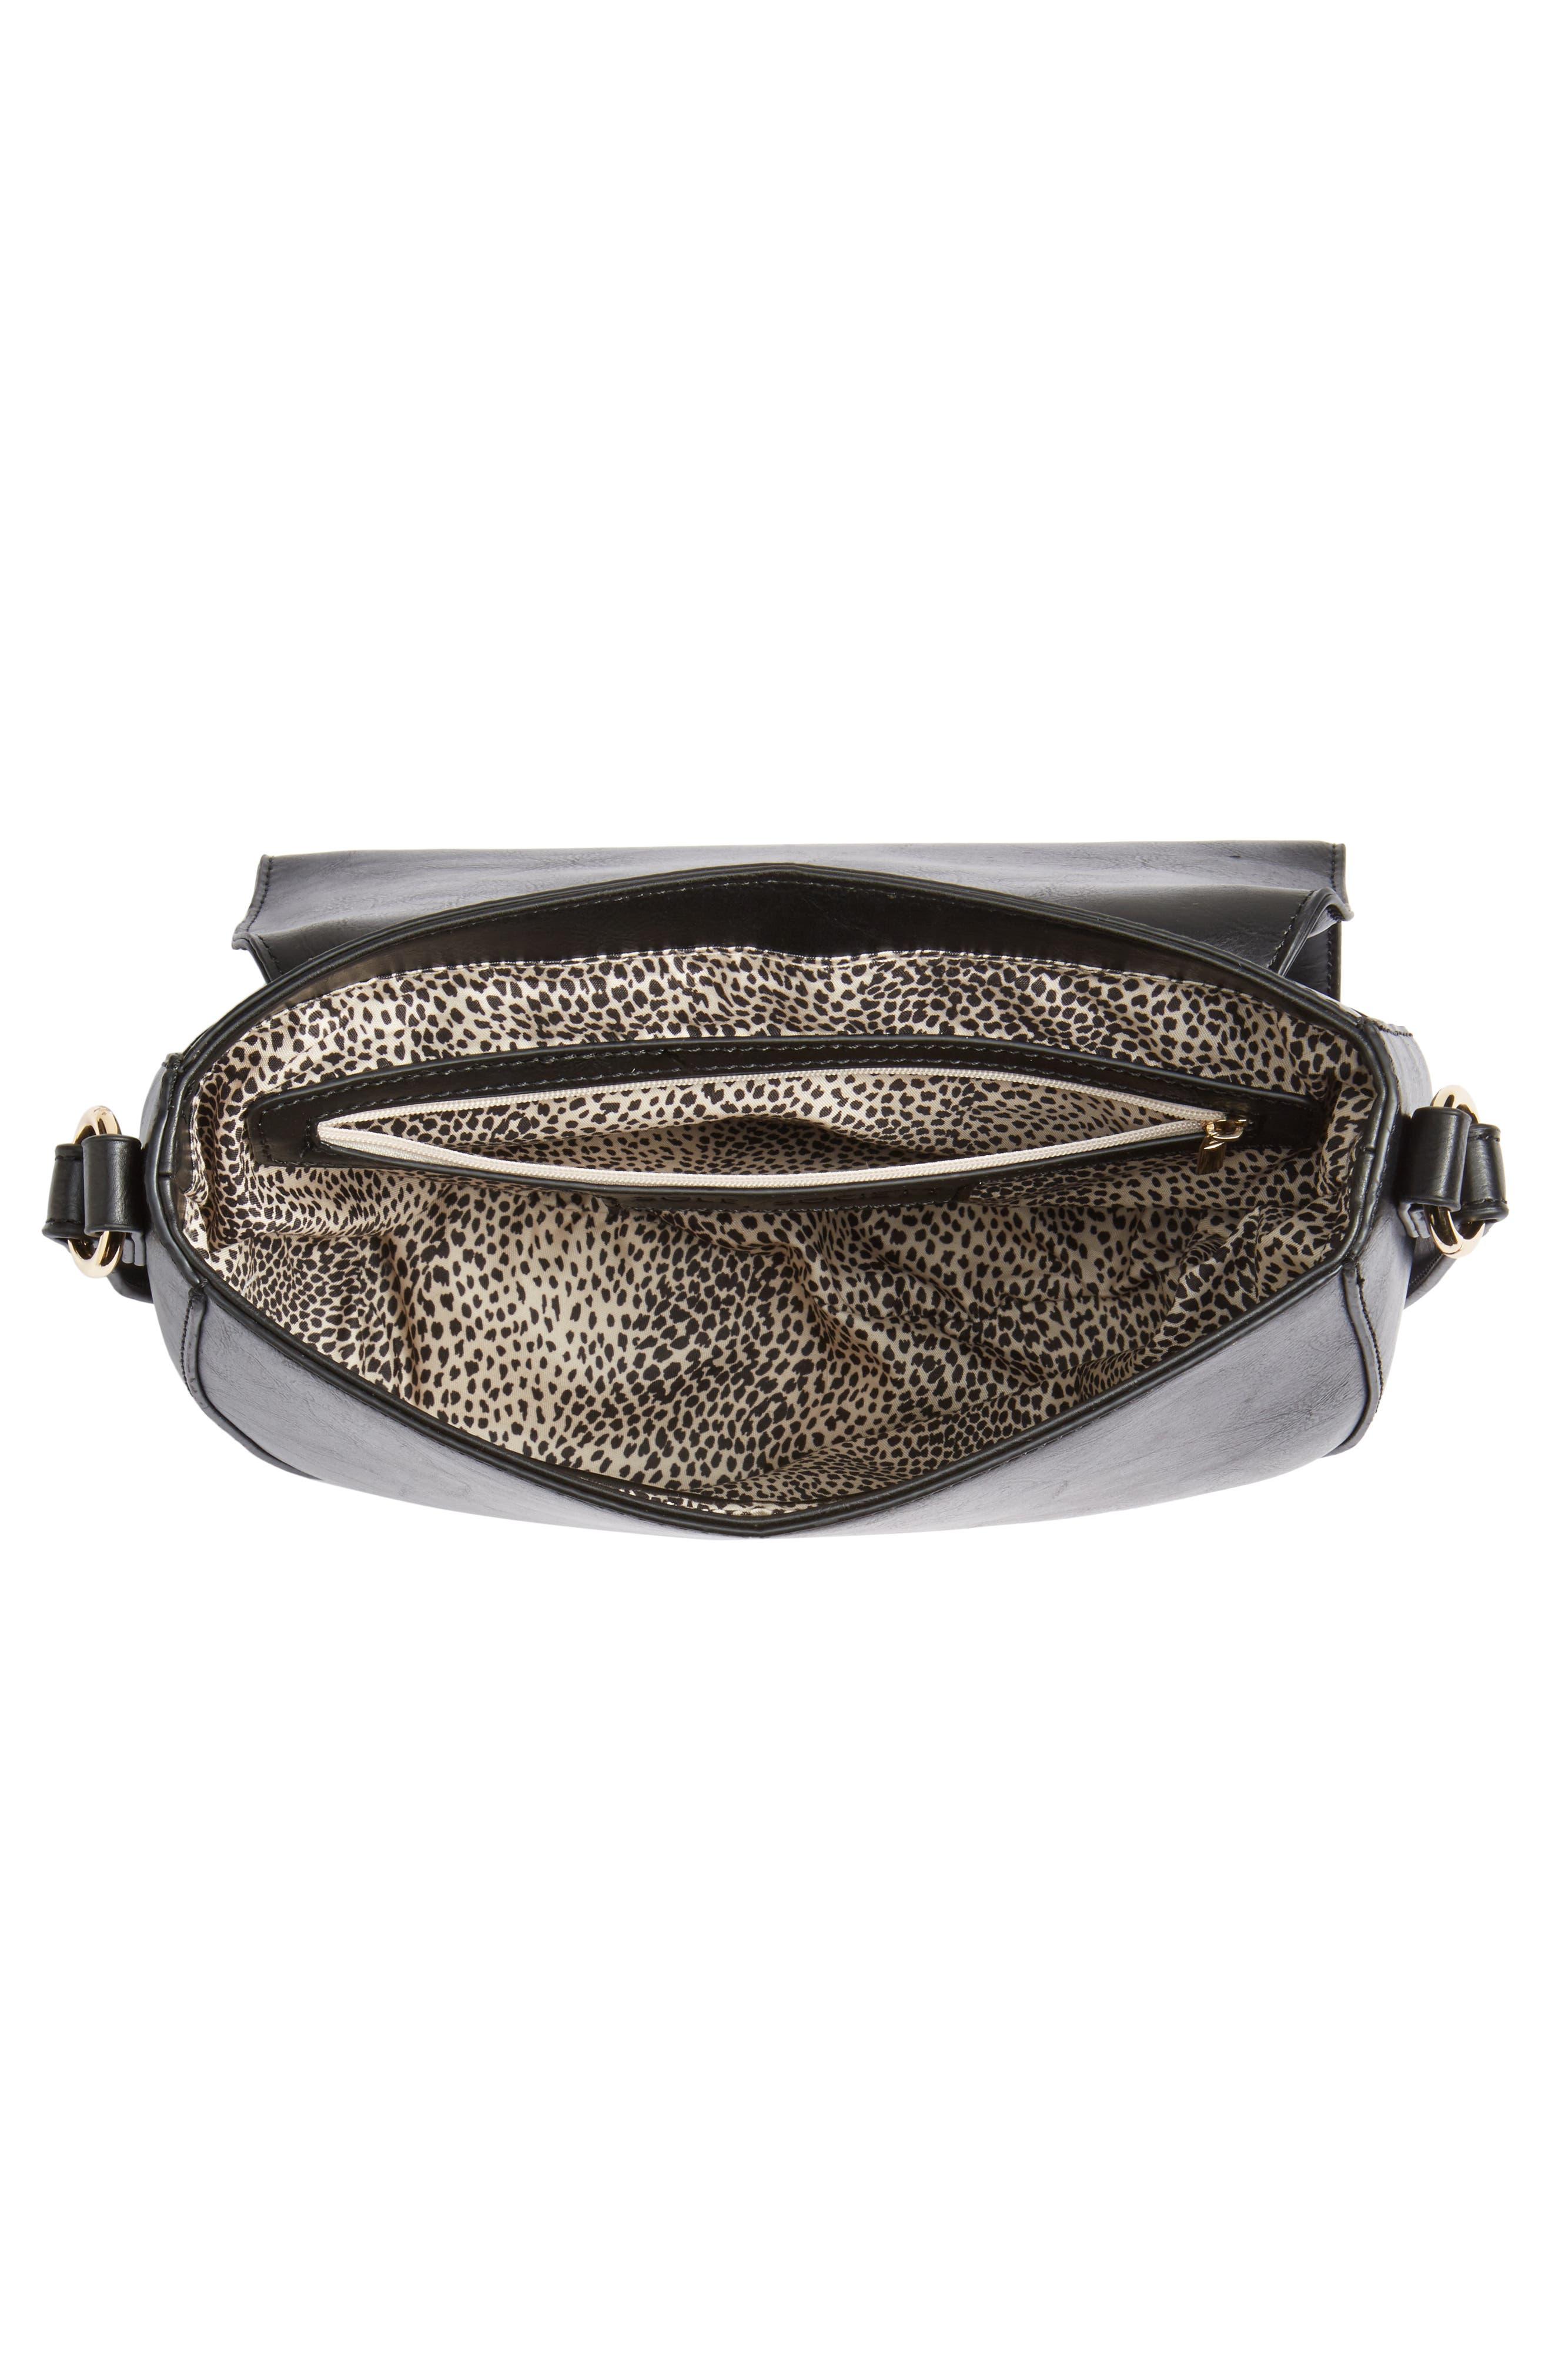 Piri Faux Leather Saddle Bag,                             Alternate thumbnail 4, color,                             001